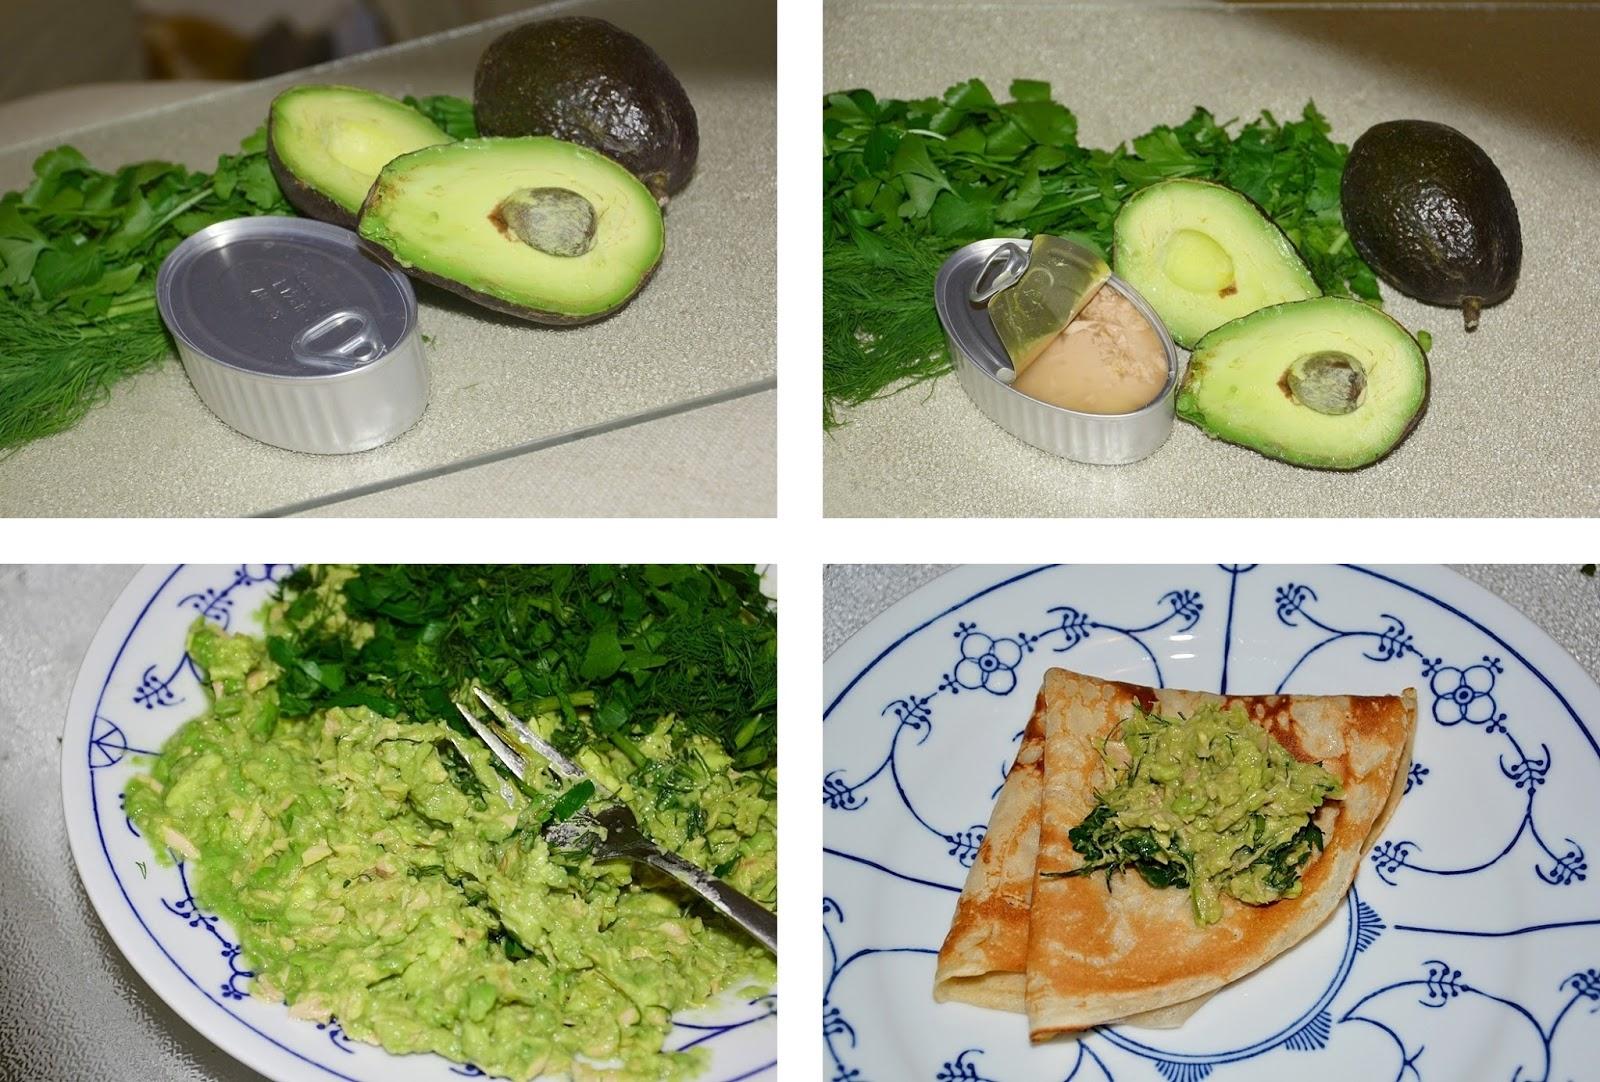 Food recipe, Rezept mit Avocado, Avocado dish, Gerichte aus Avocado